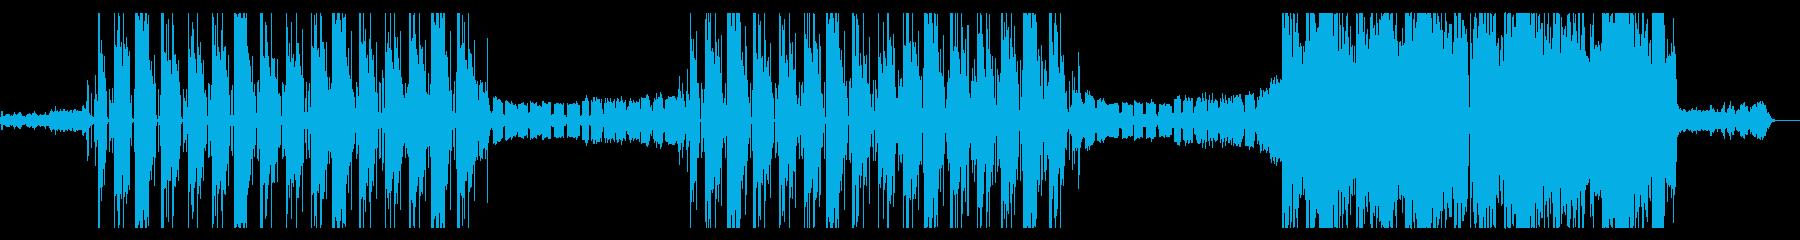 K-POP ハード TRAP EDMの再生済みの波形